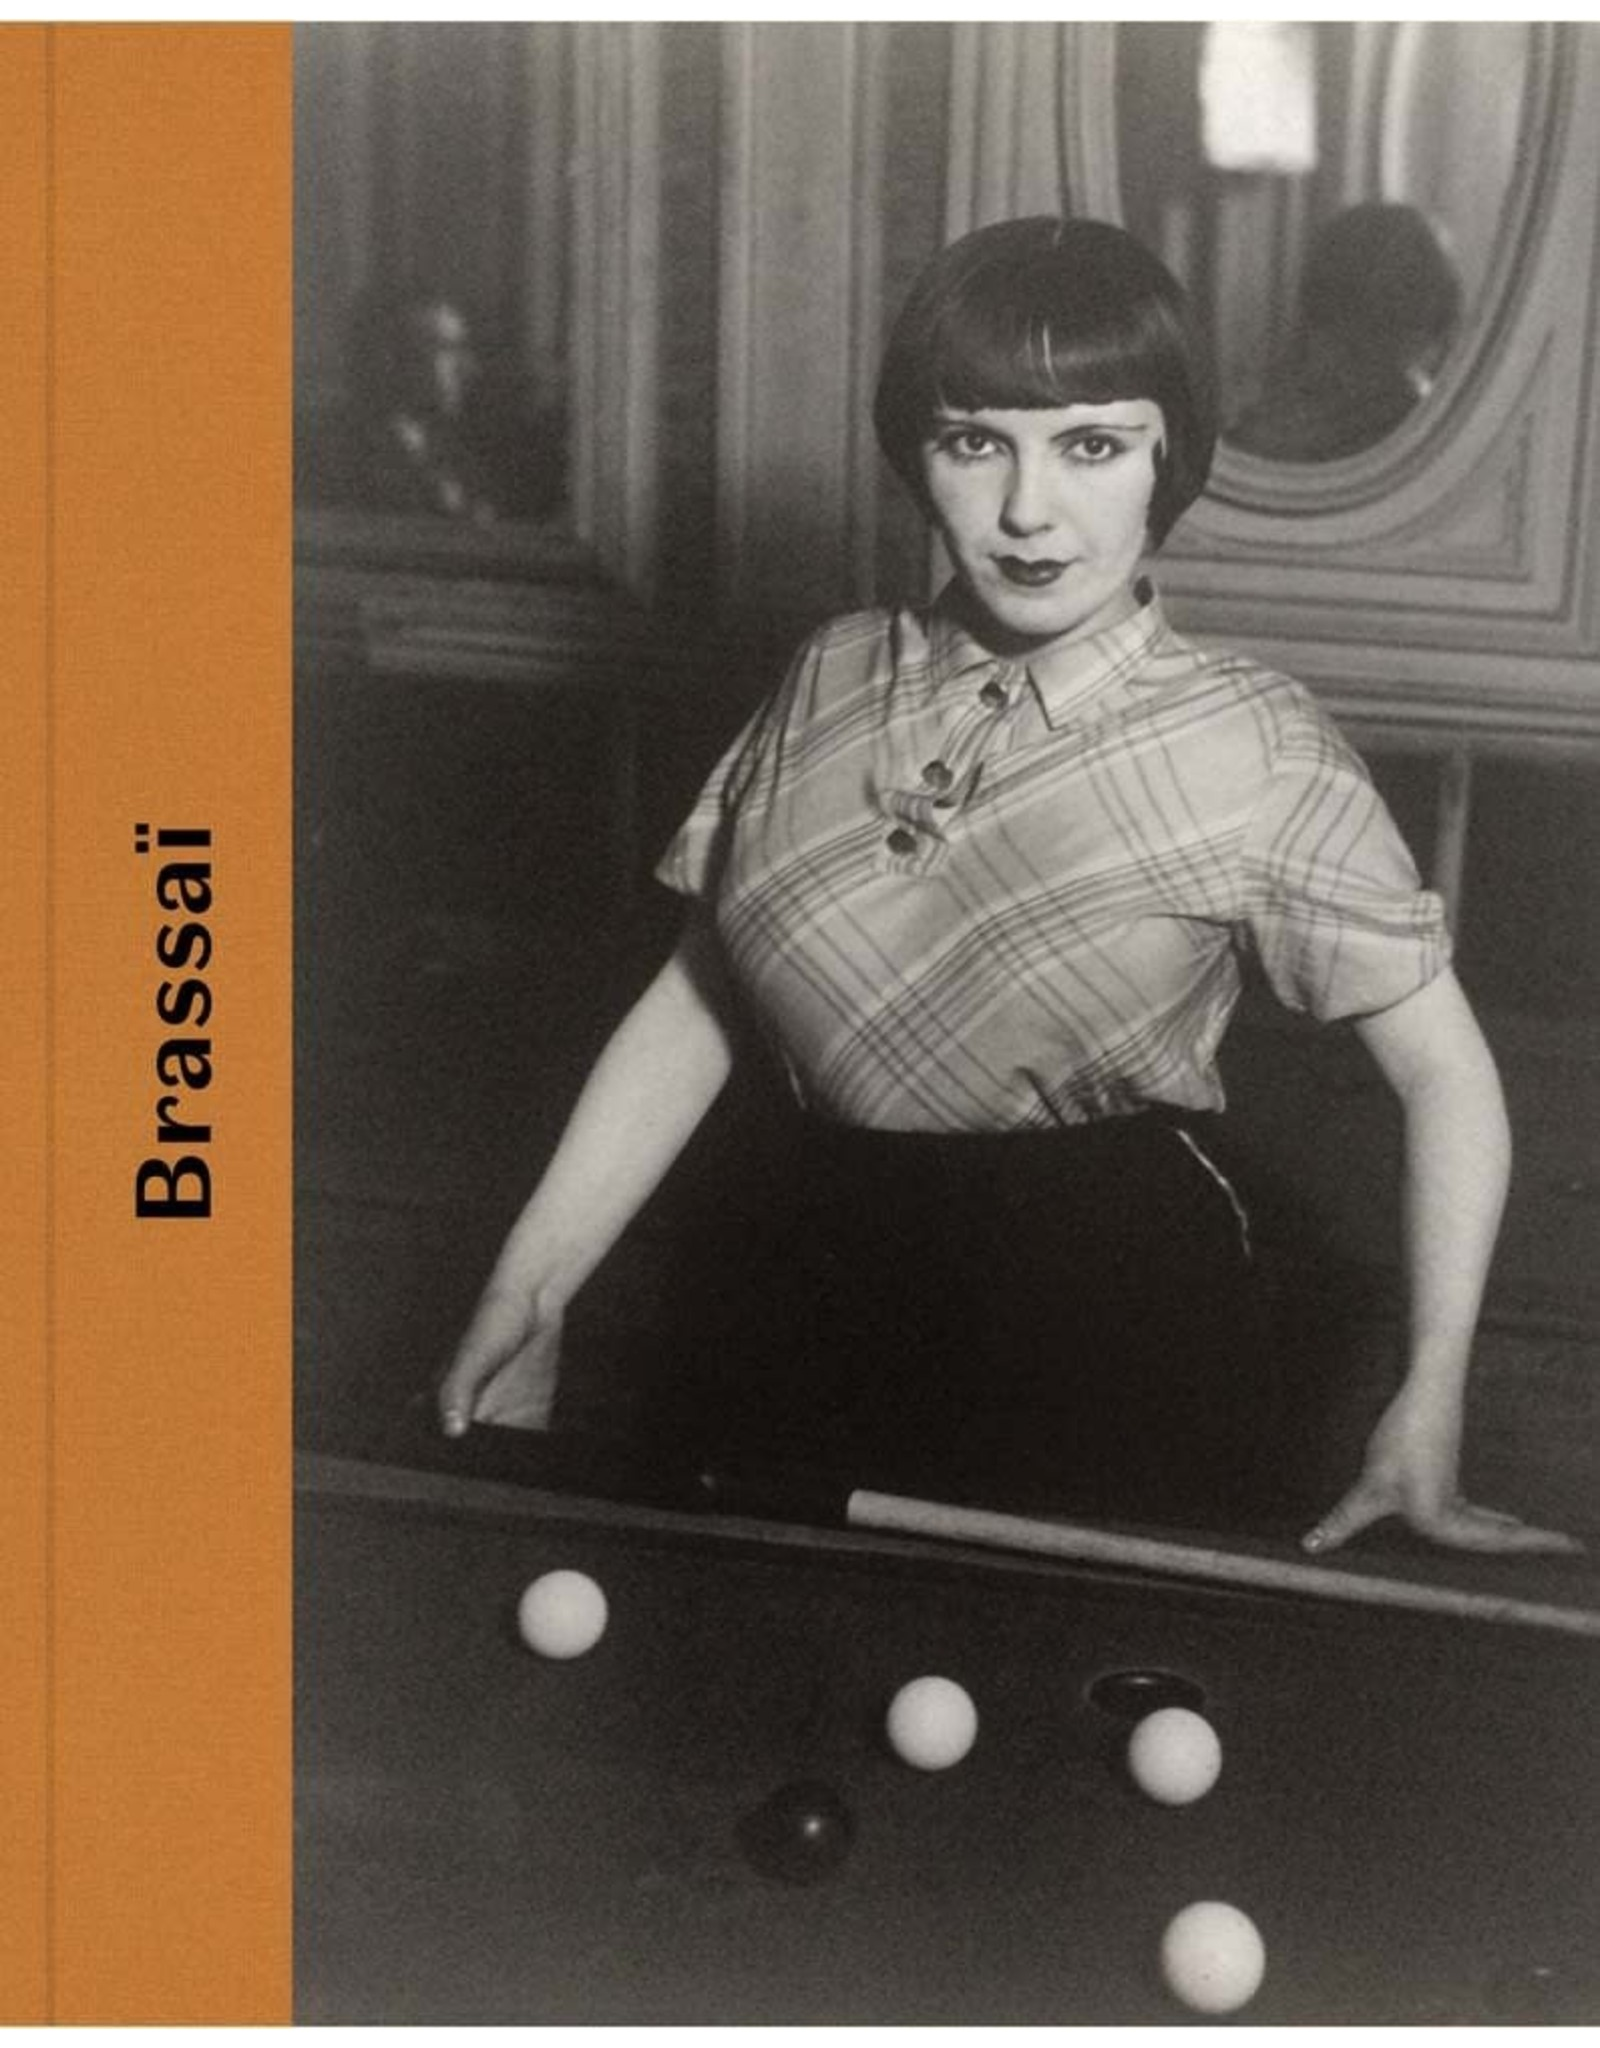 Brassaï